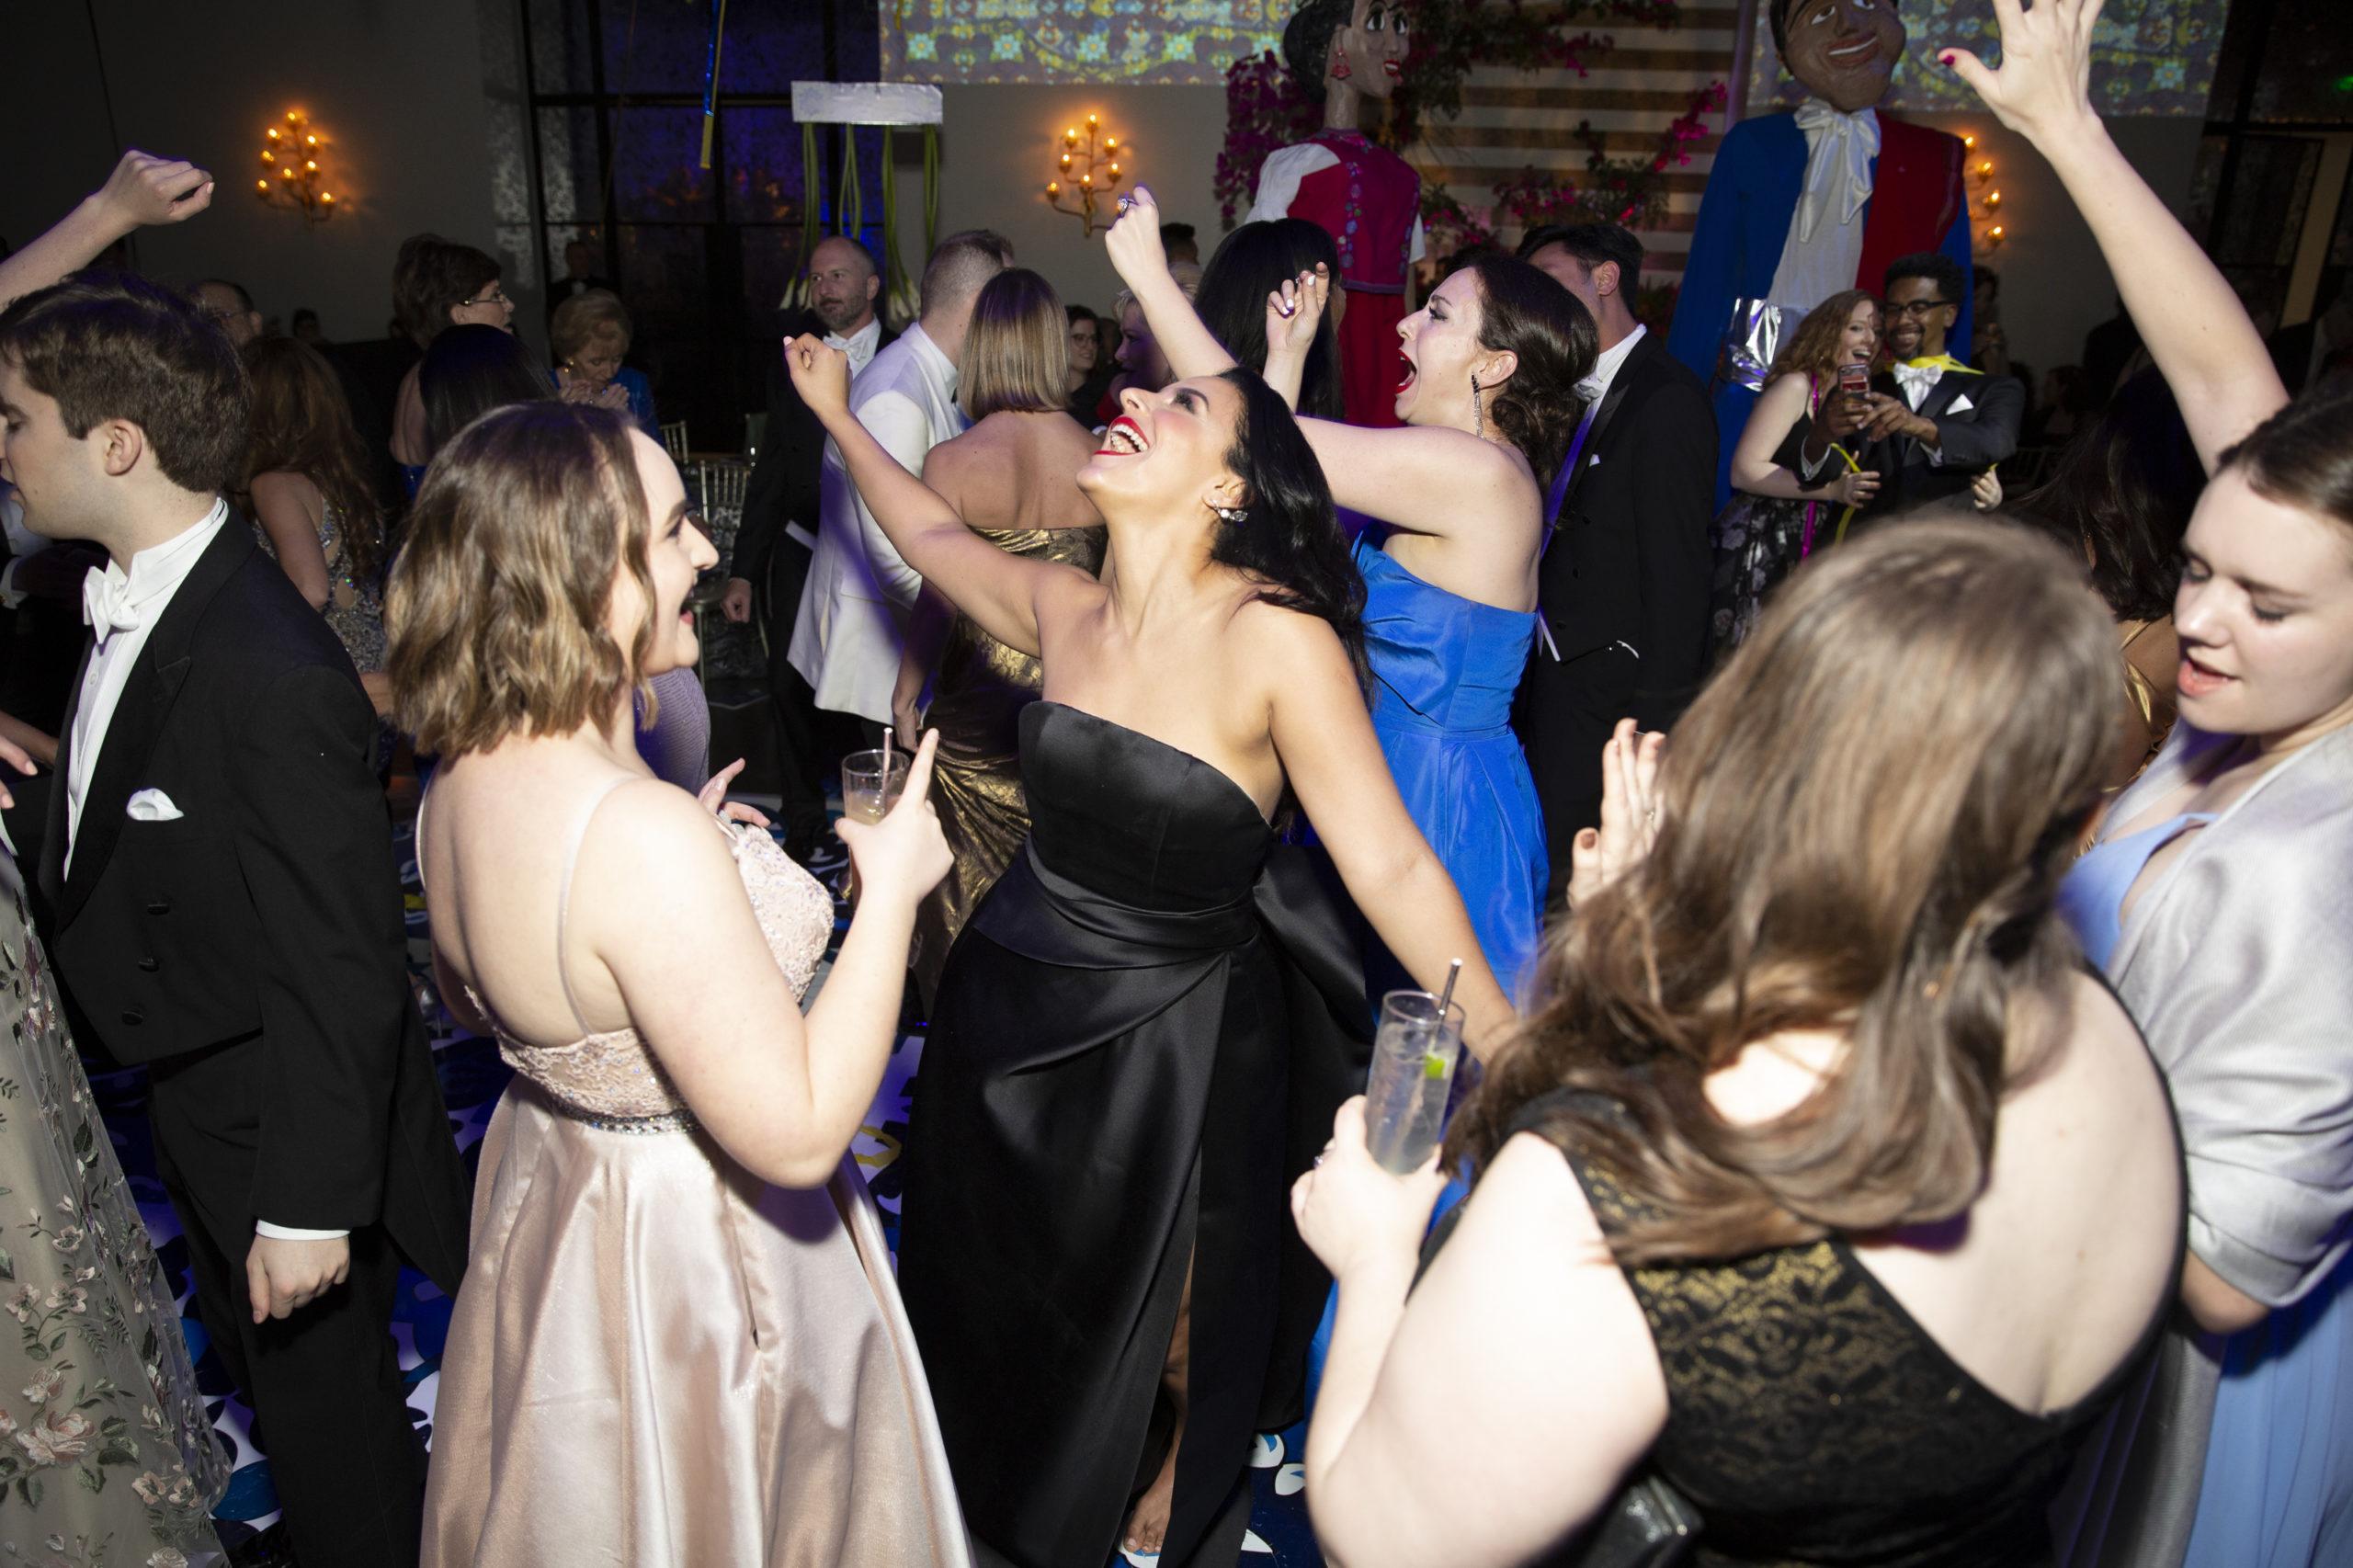 Ambiance dancing